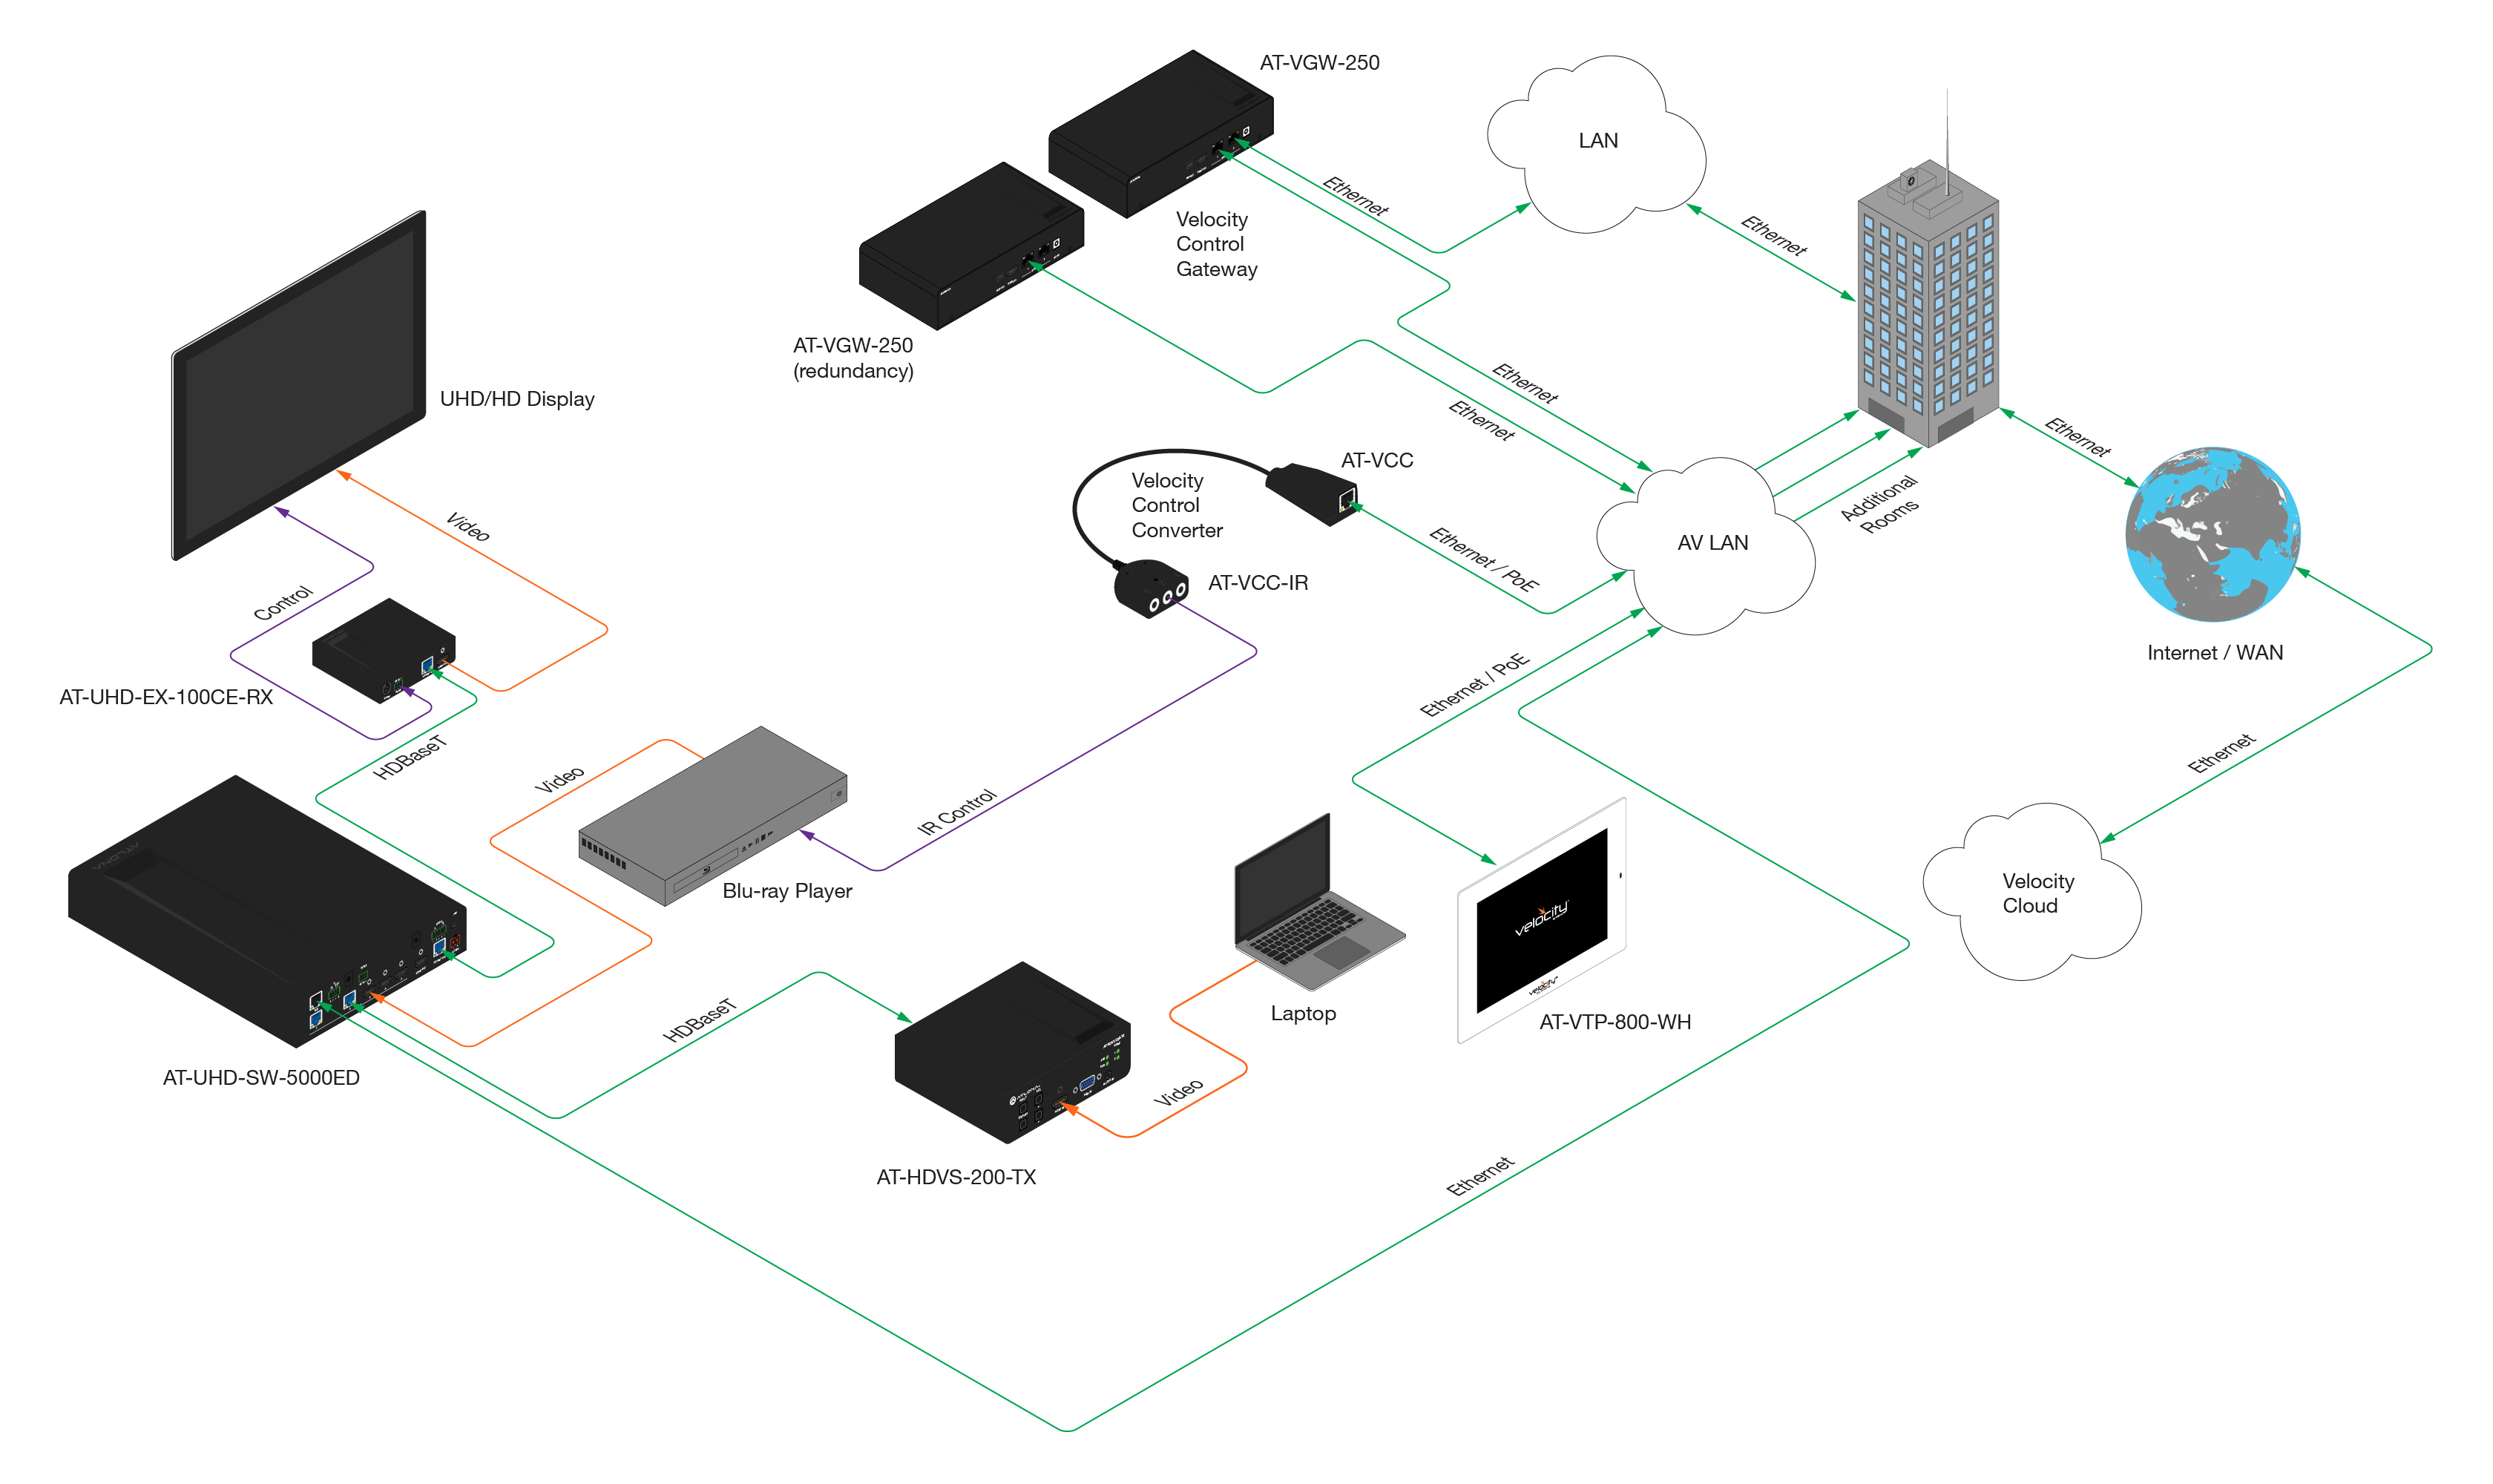 + облачный сервер